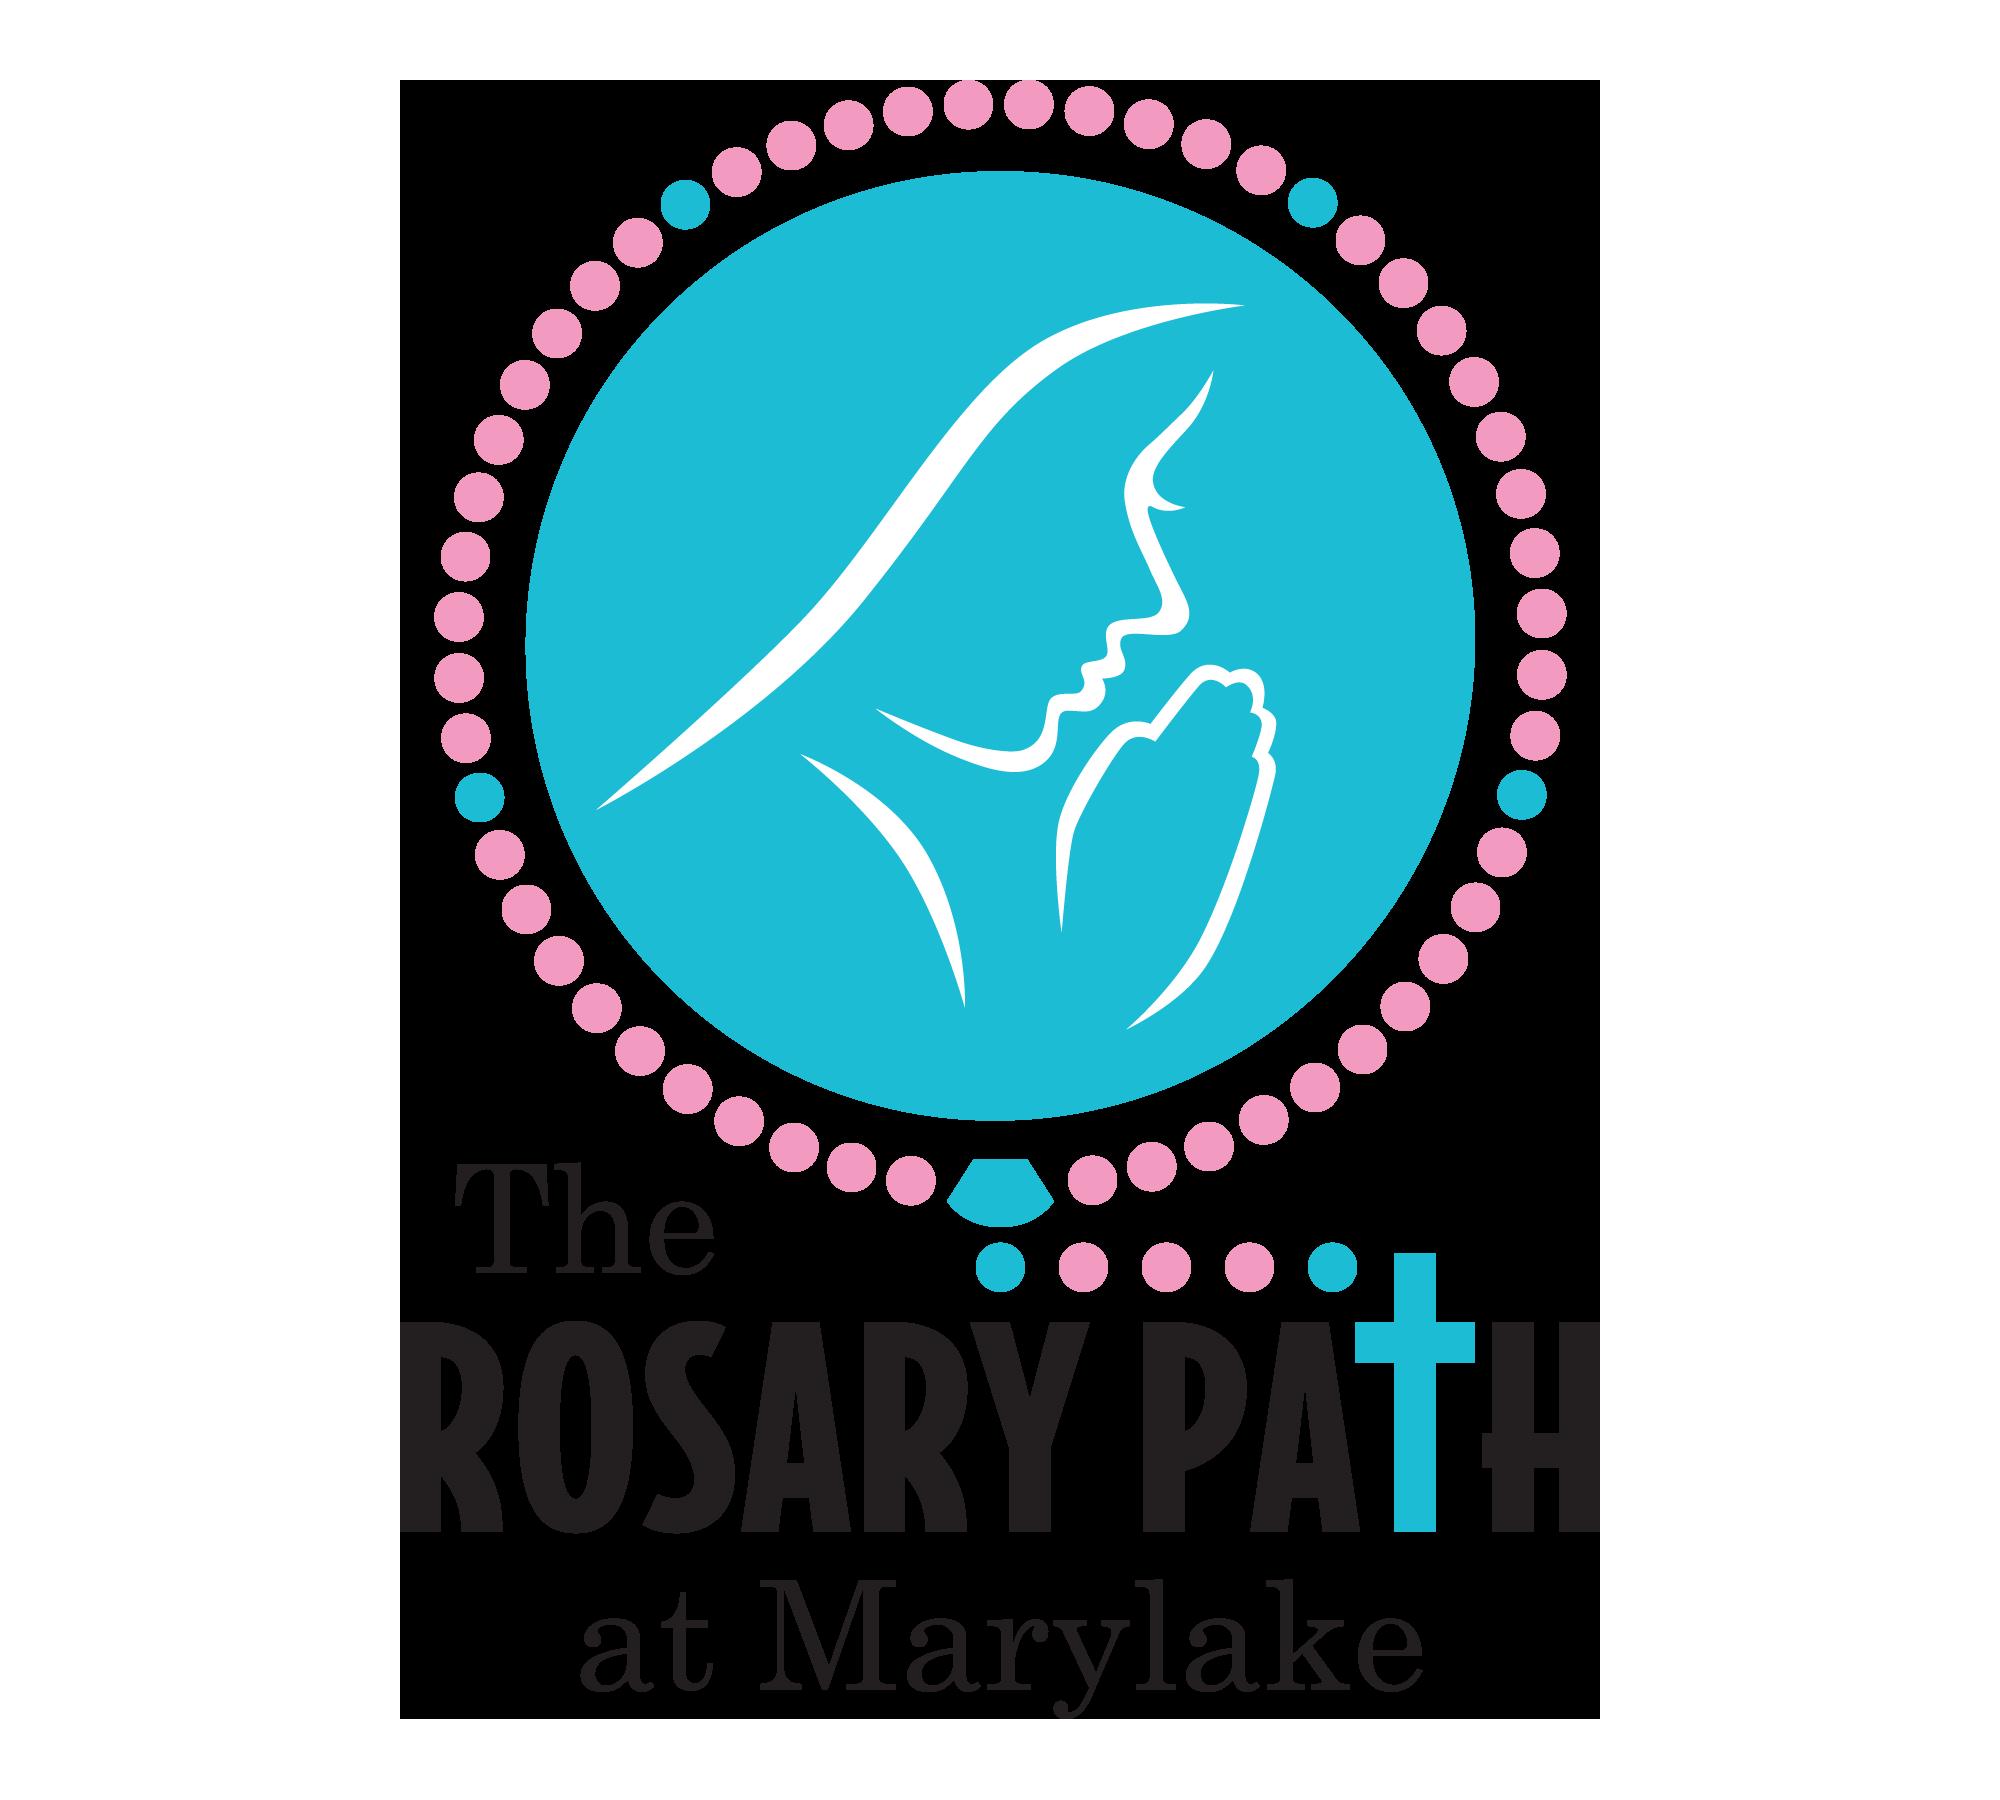 rosary_path_logo_OL.png